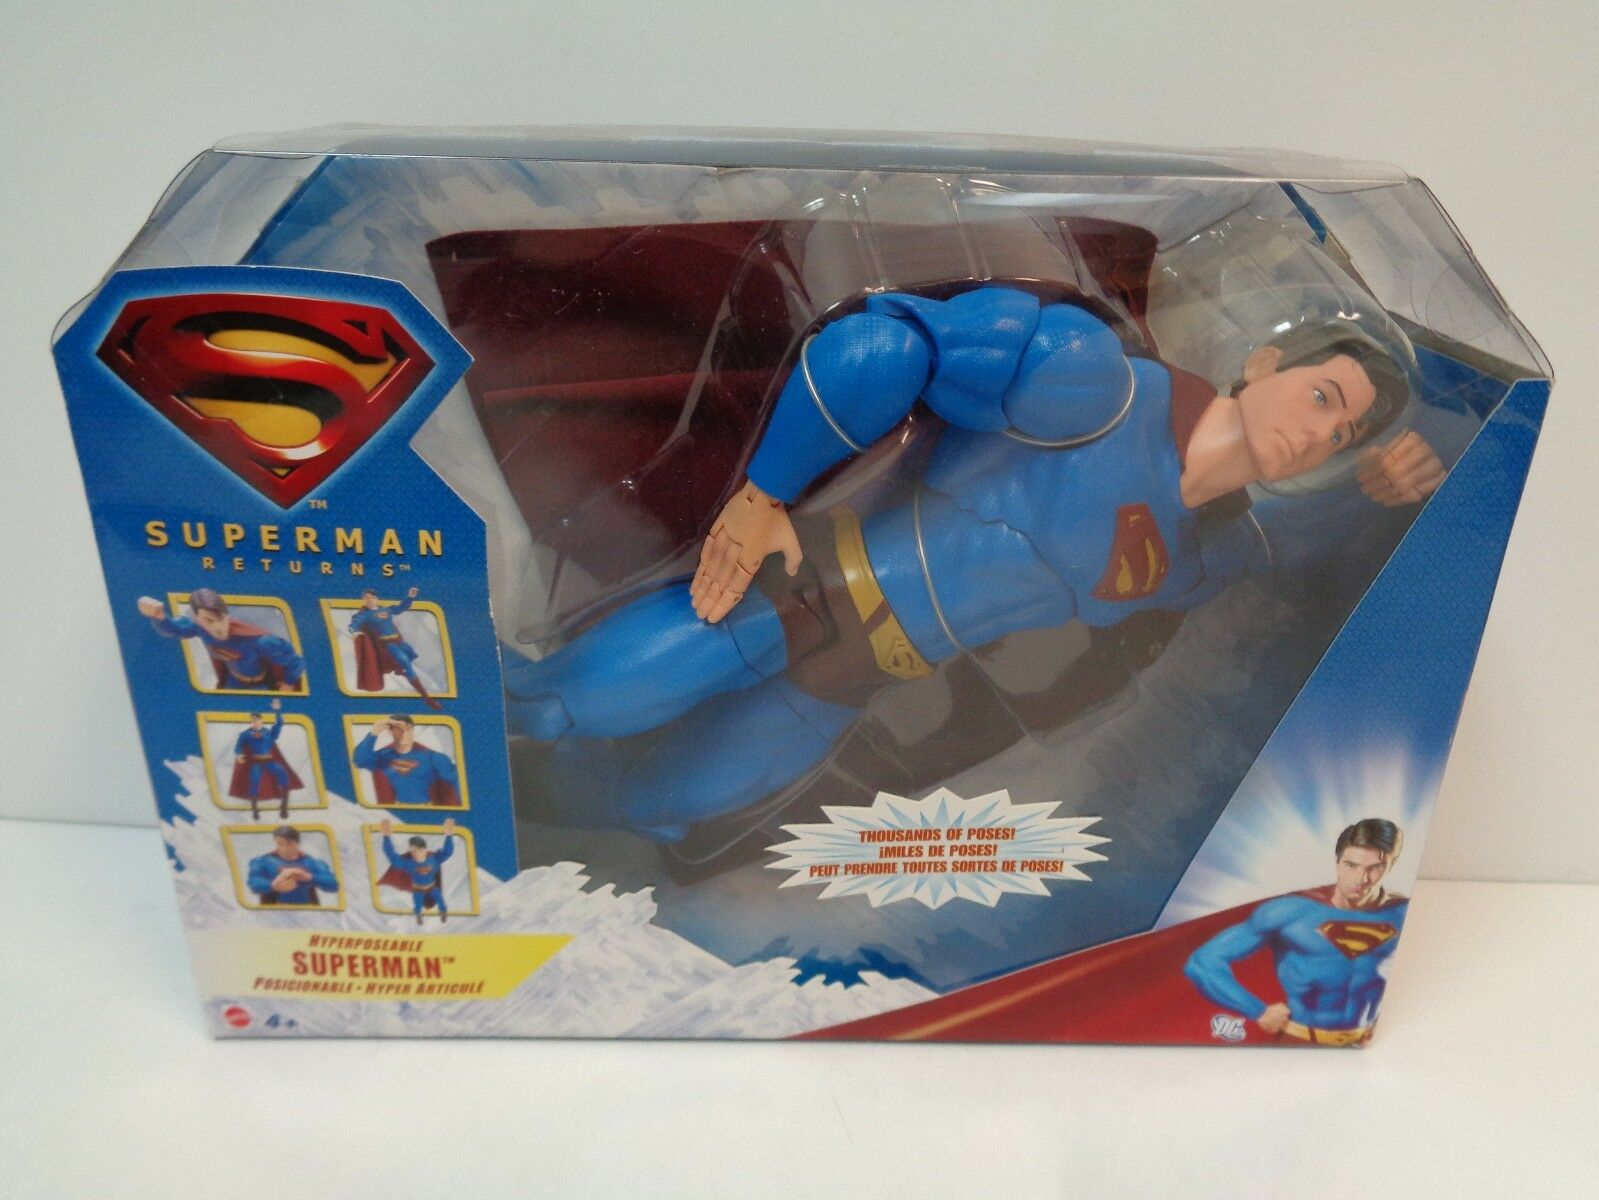 Dc comics hyperposeable superman, superman returns mib 2006 mattel